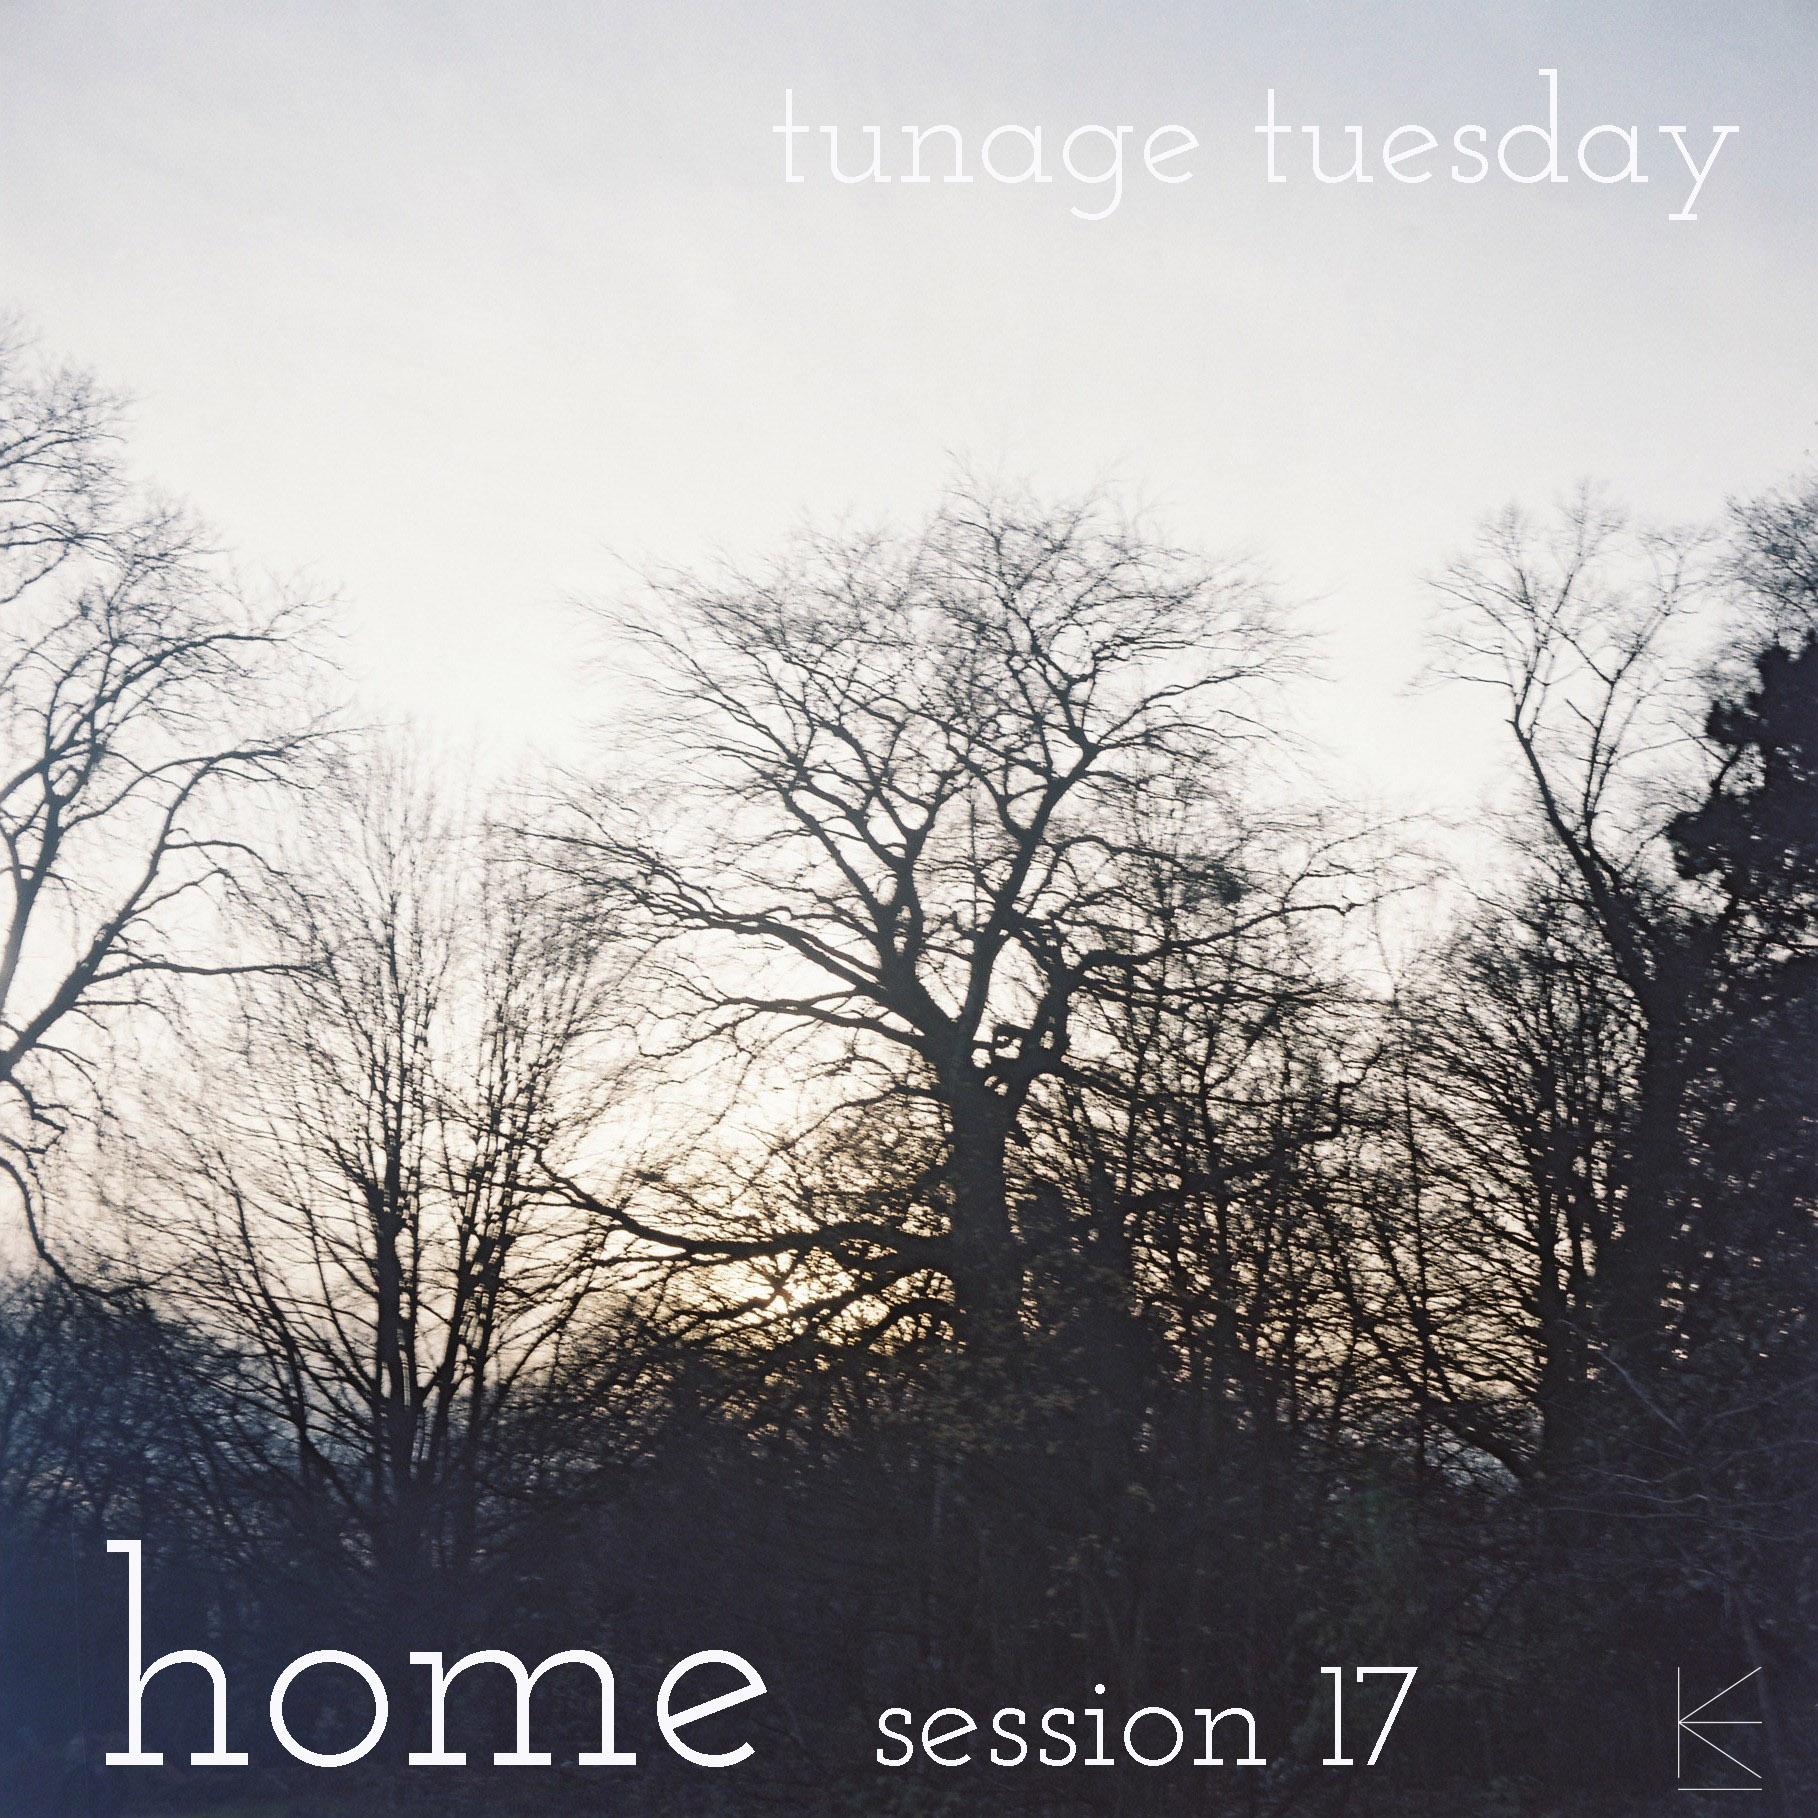 home session 17.jpg